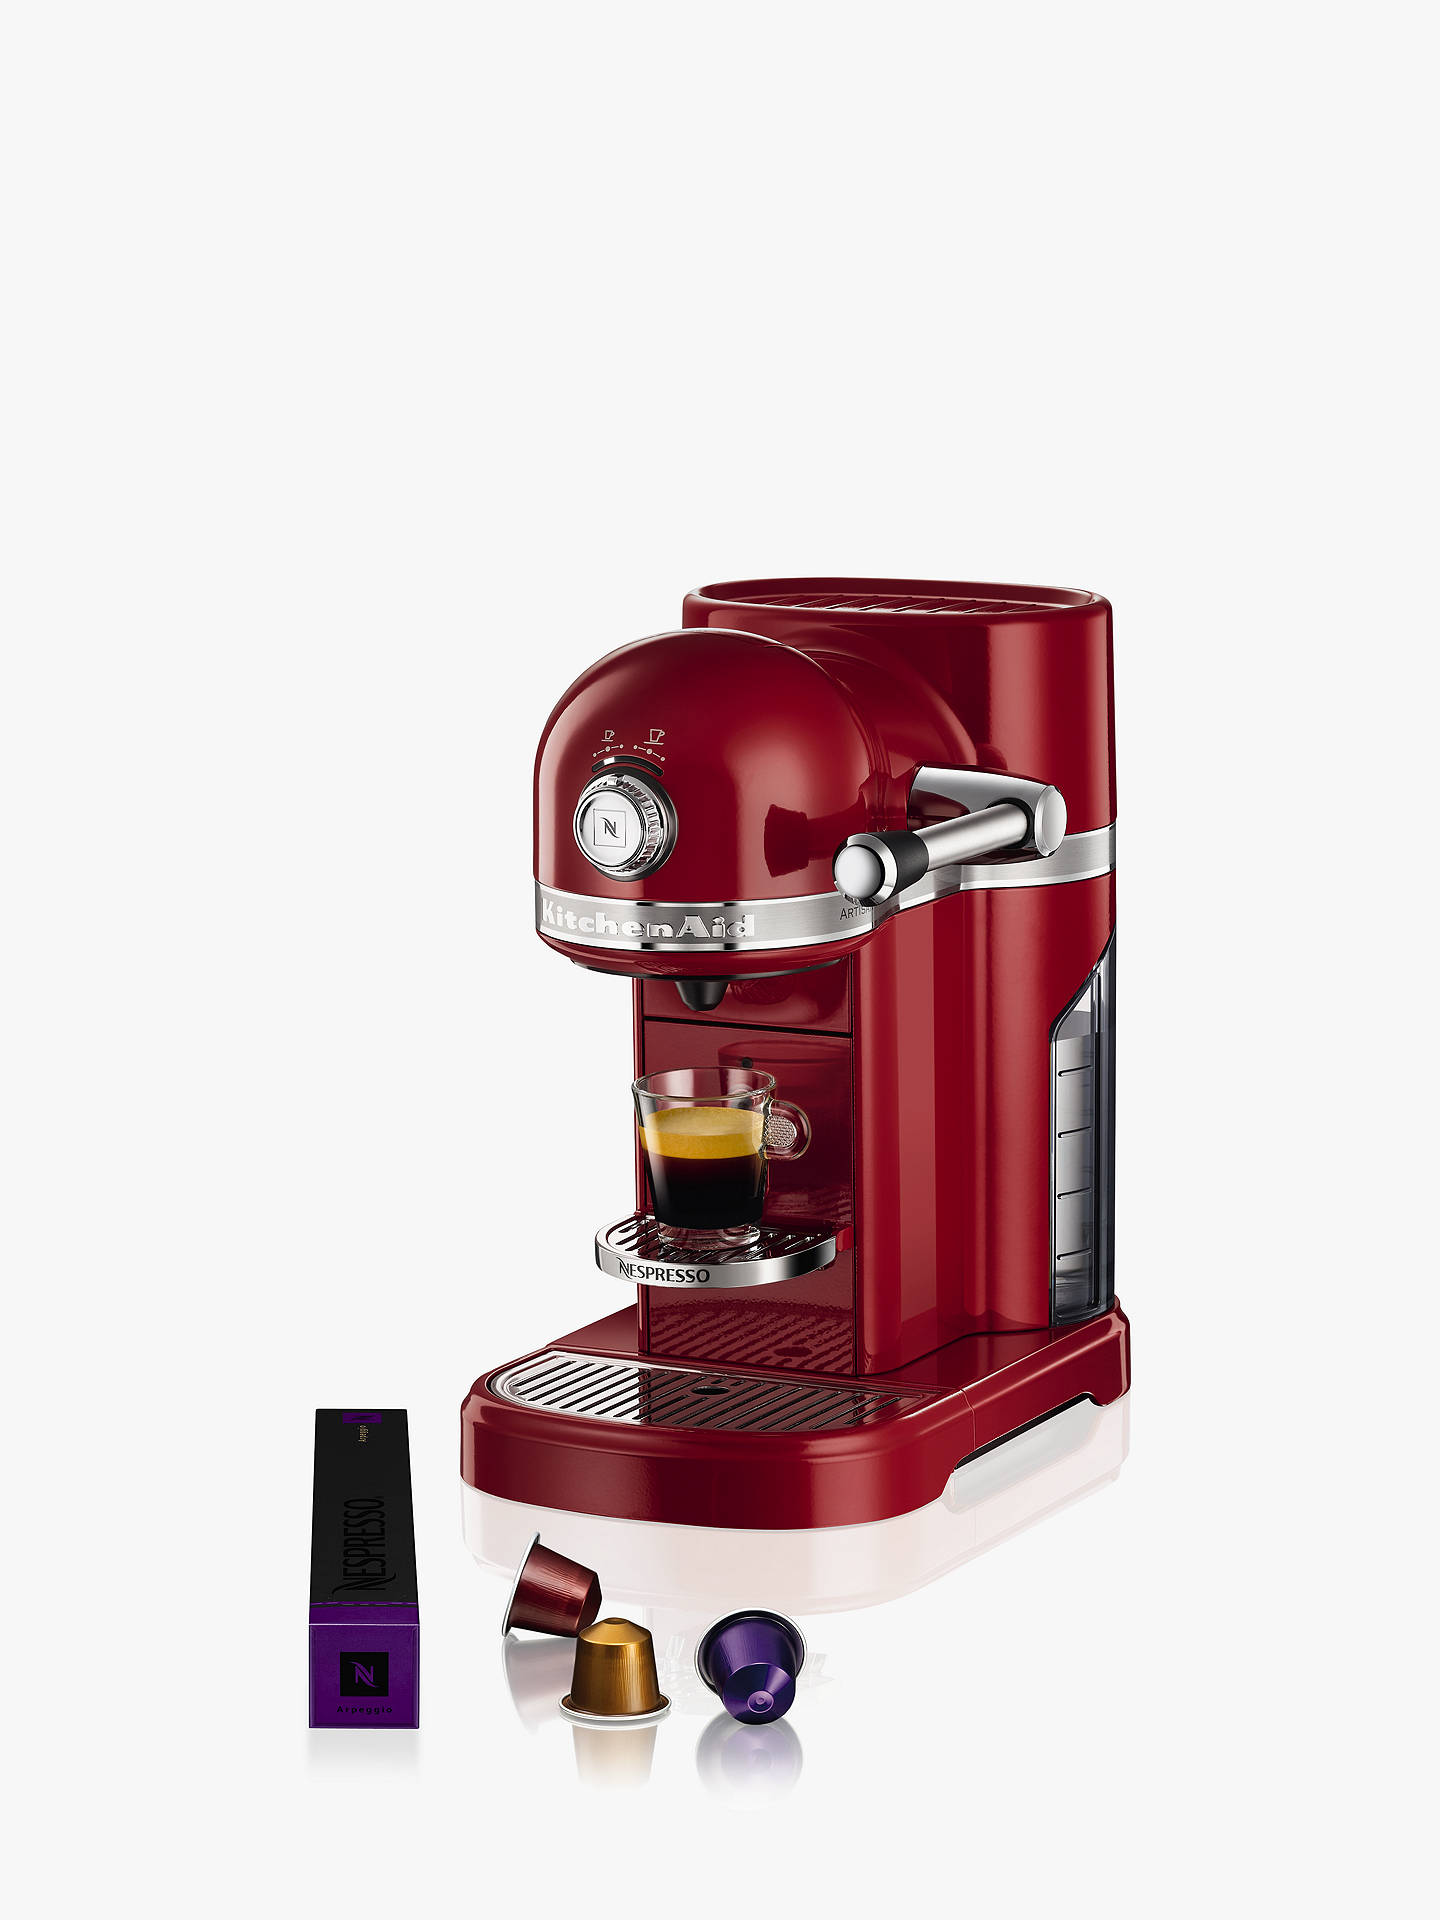 Nespresso Artisan Coffee Machine By Kitchenaid At John